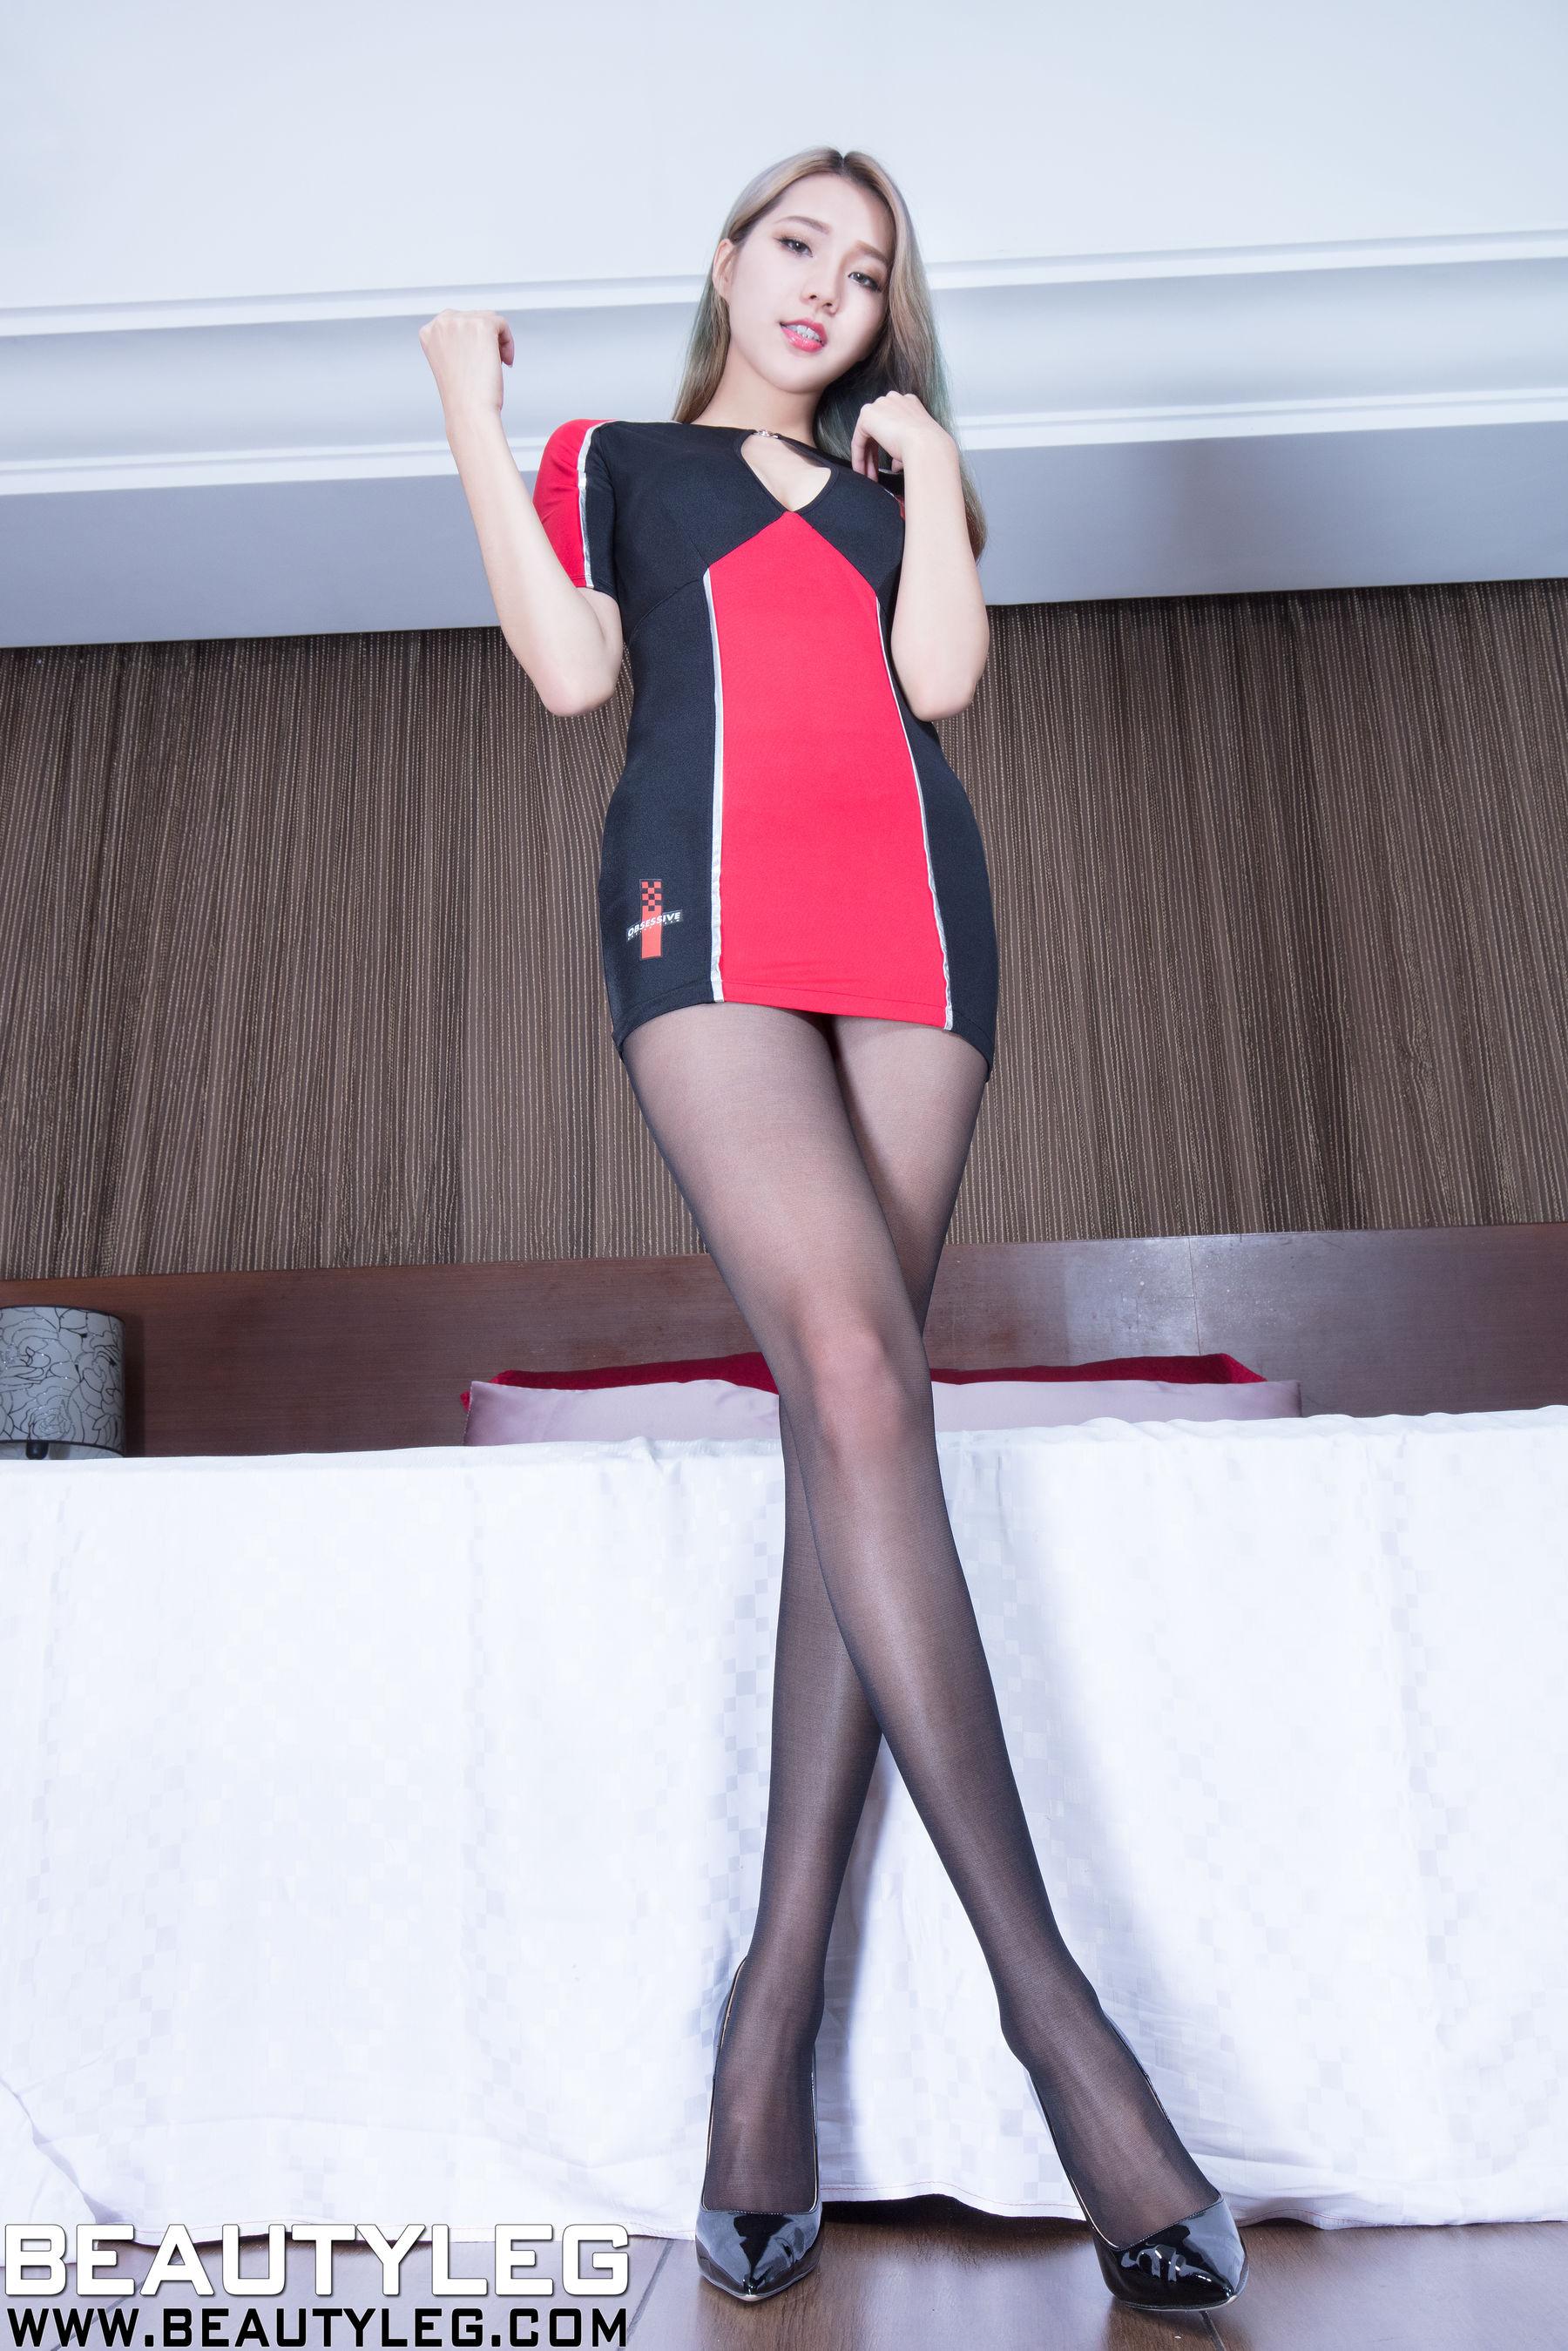 VOL.82 [Beautyleg]丝袜美女美腿:林千如(腿模Anita)超高清个人性感漂亮大图(41P)